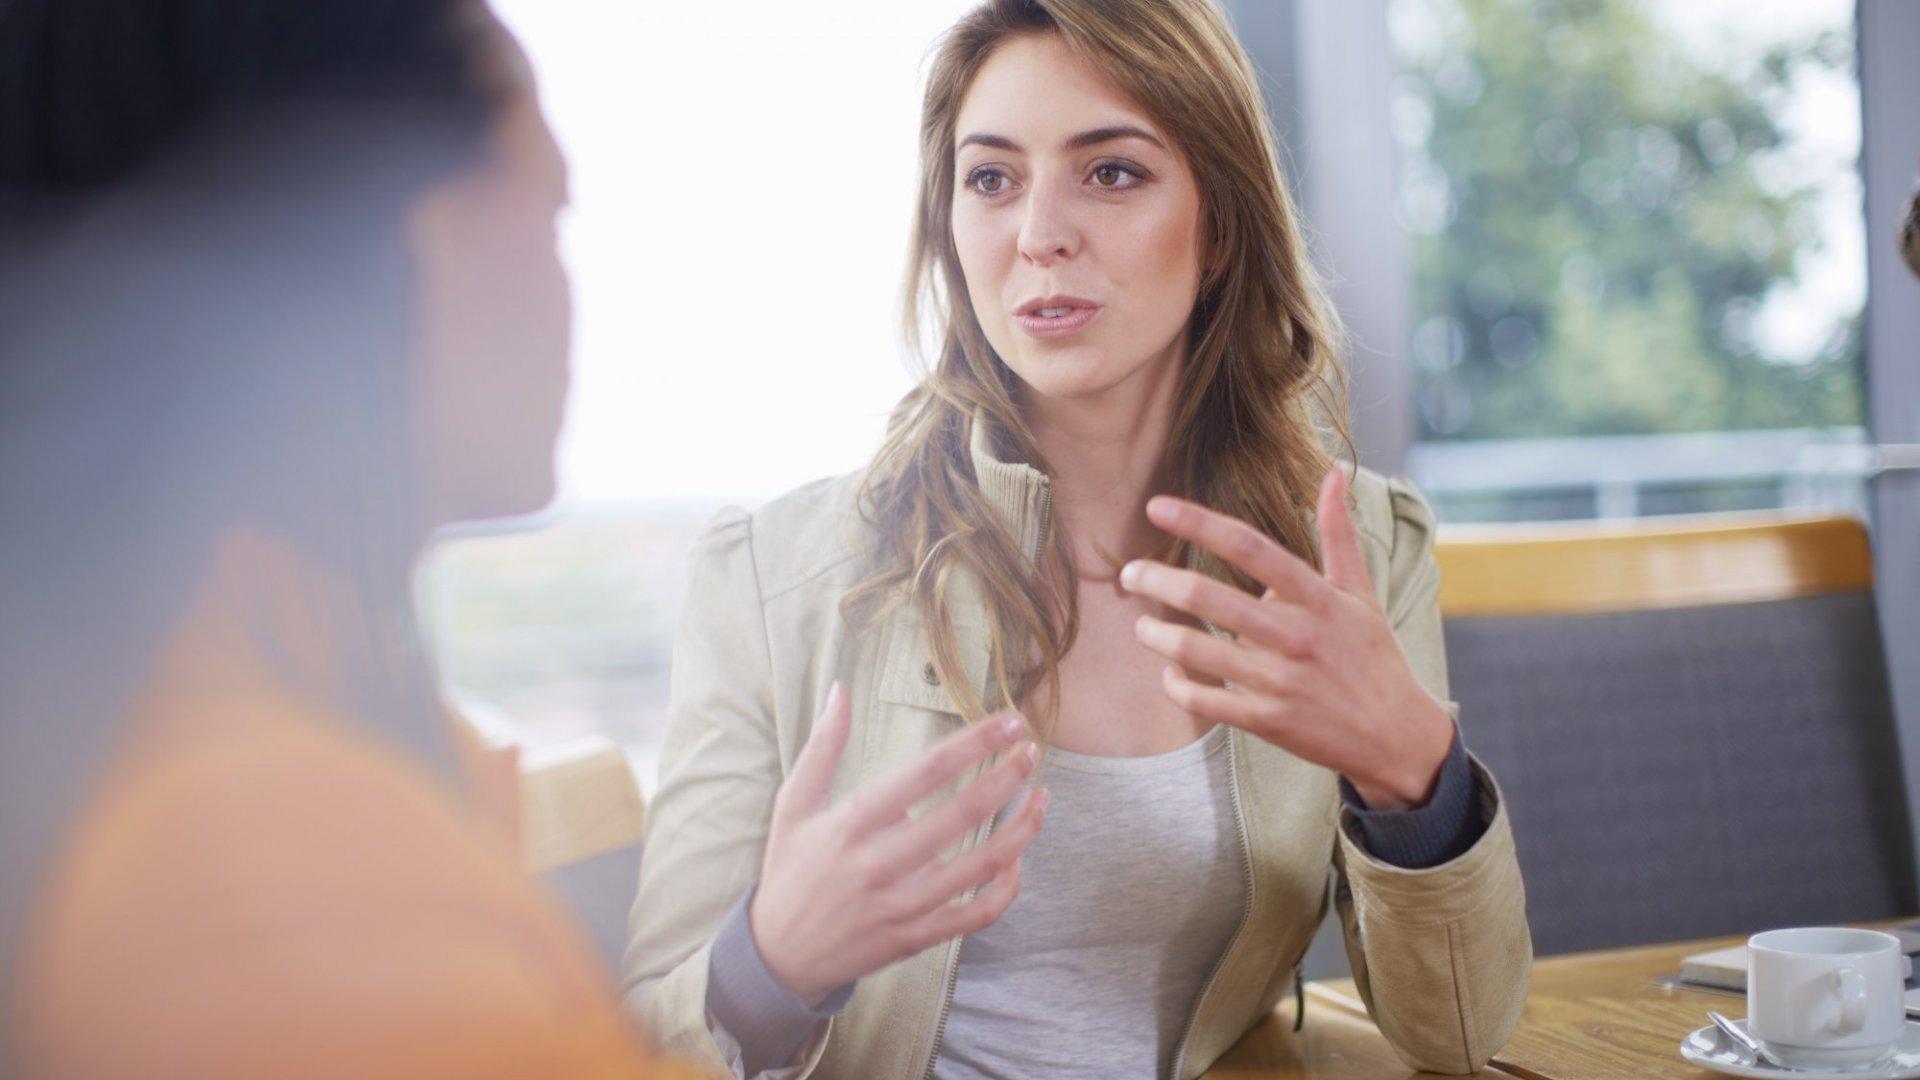 8 Simple Steps to Havinga Productive 1:1 Meeting